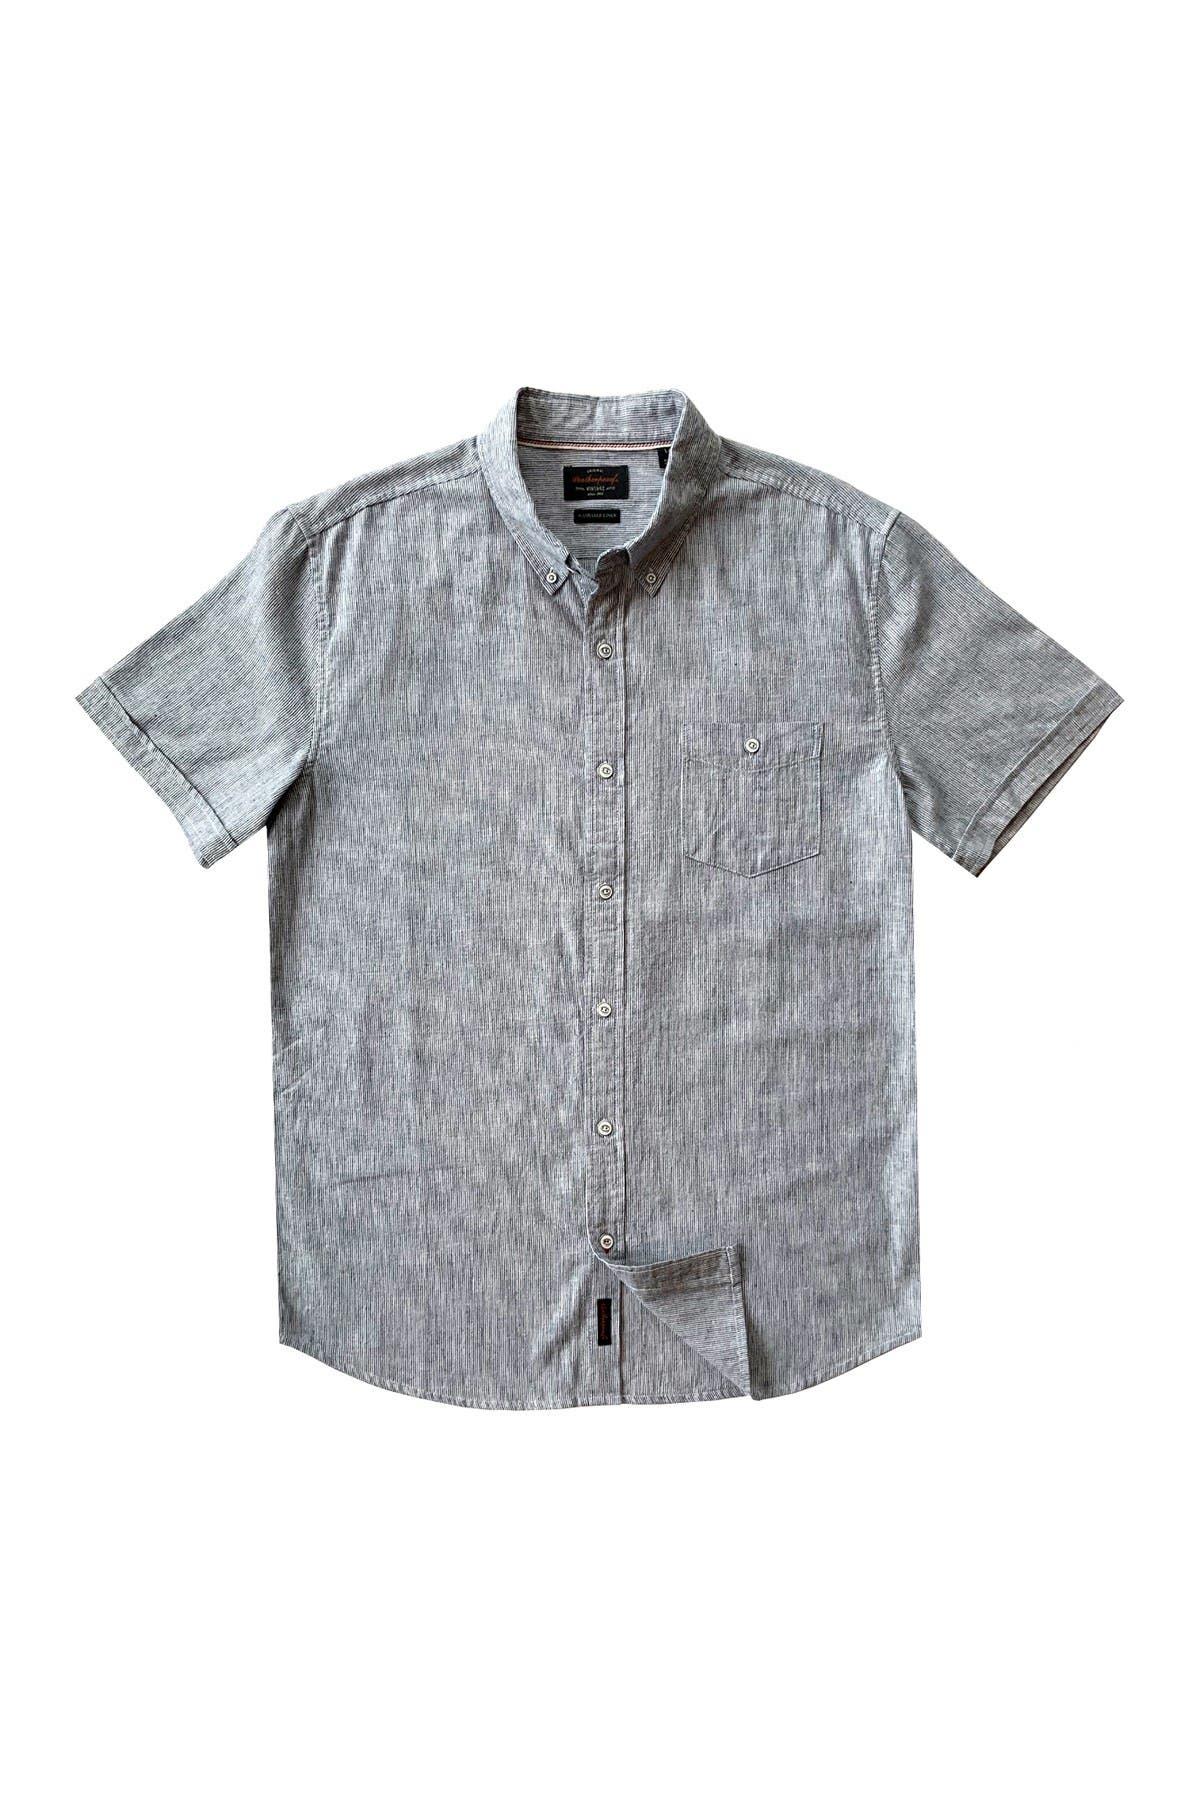 Image of Weatherproof Vintage Ticking Stripe Linen Blend Tailored Fit Shirt